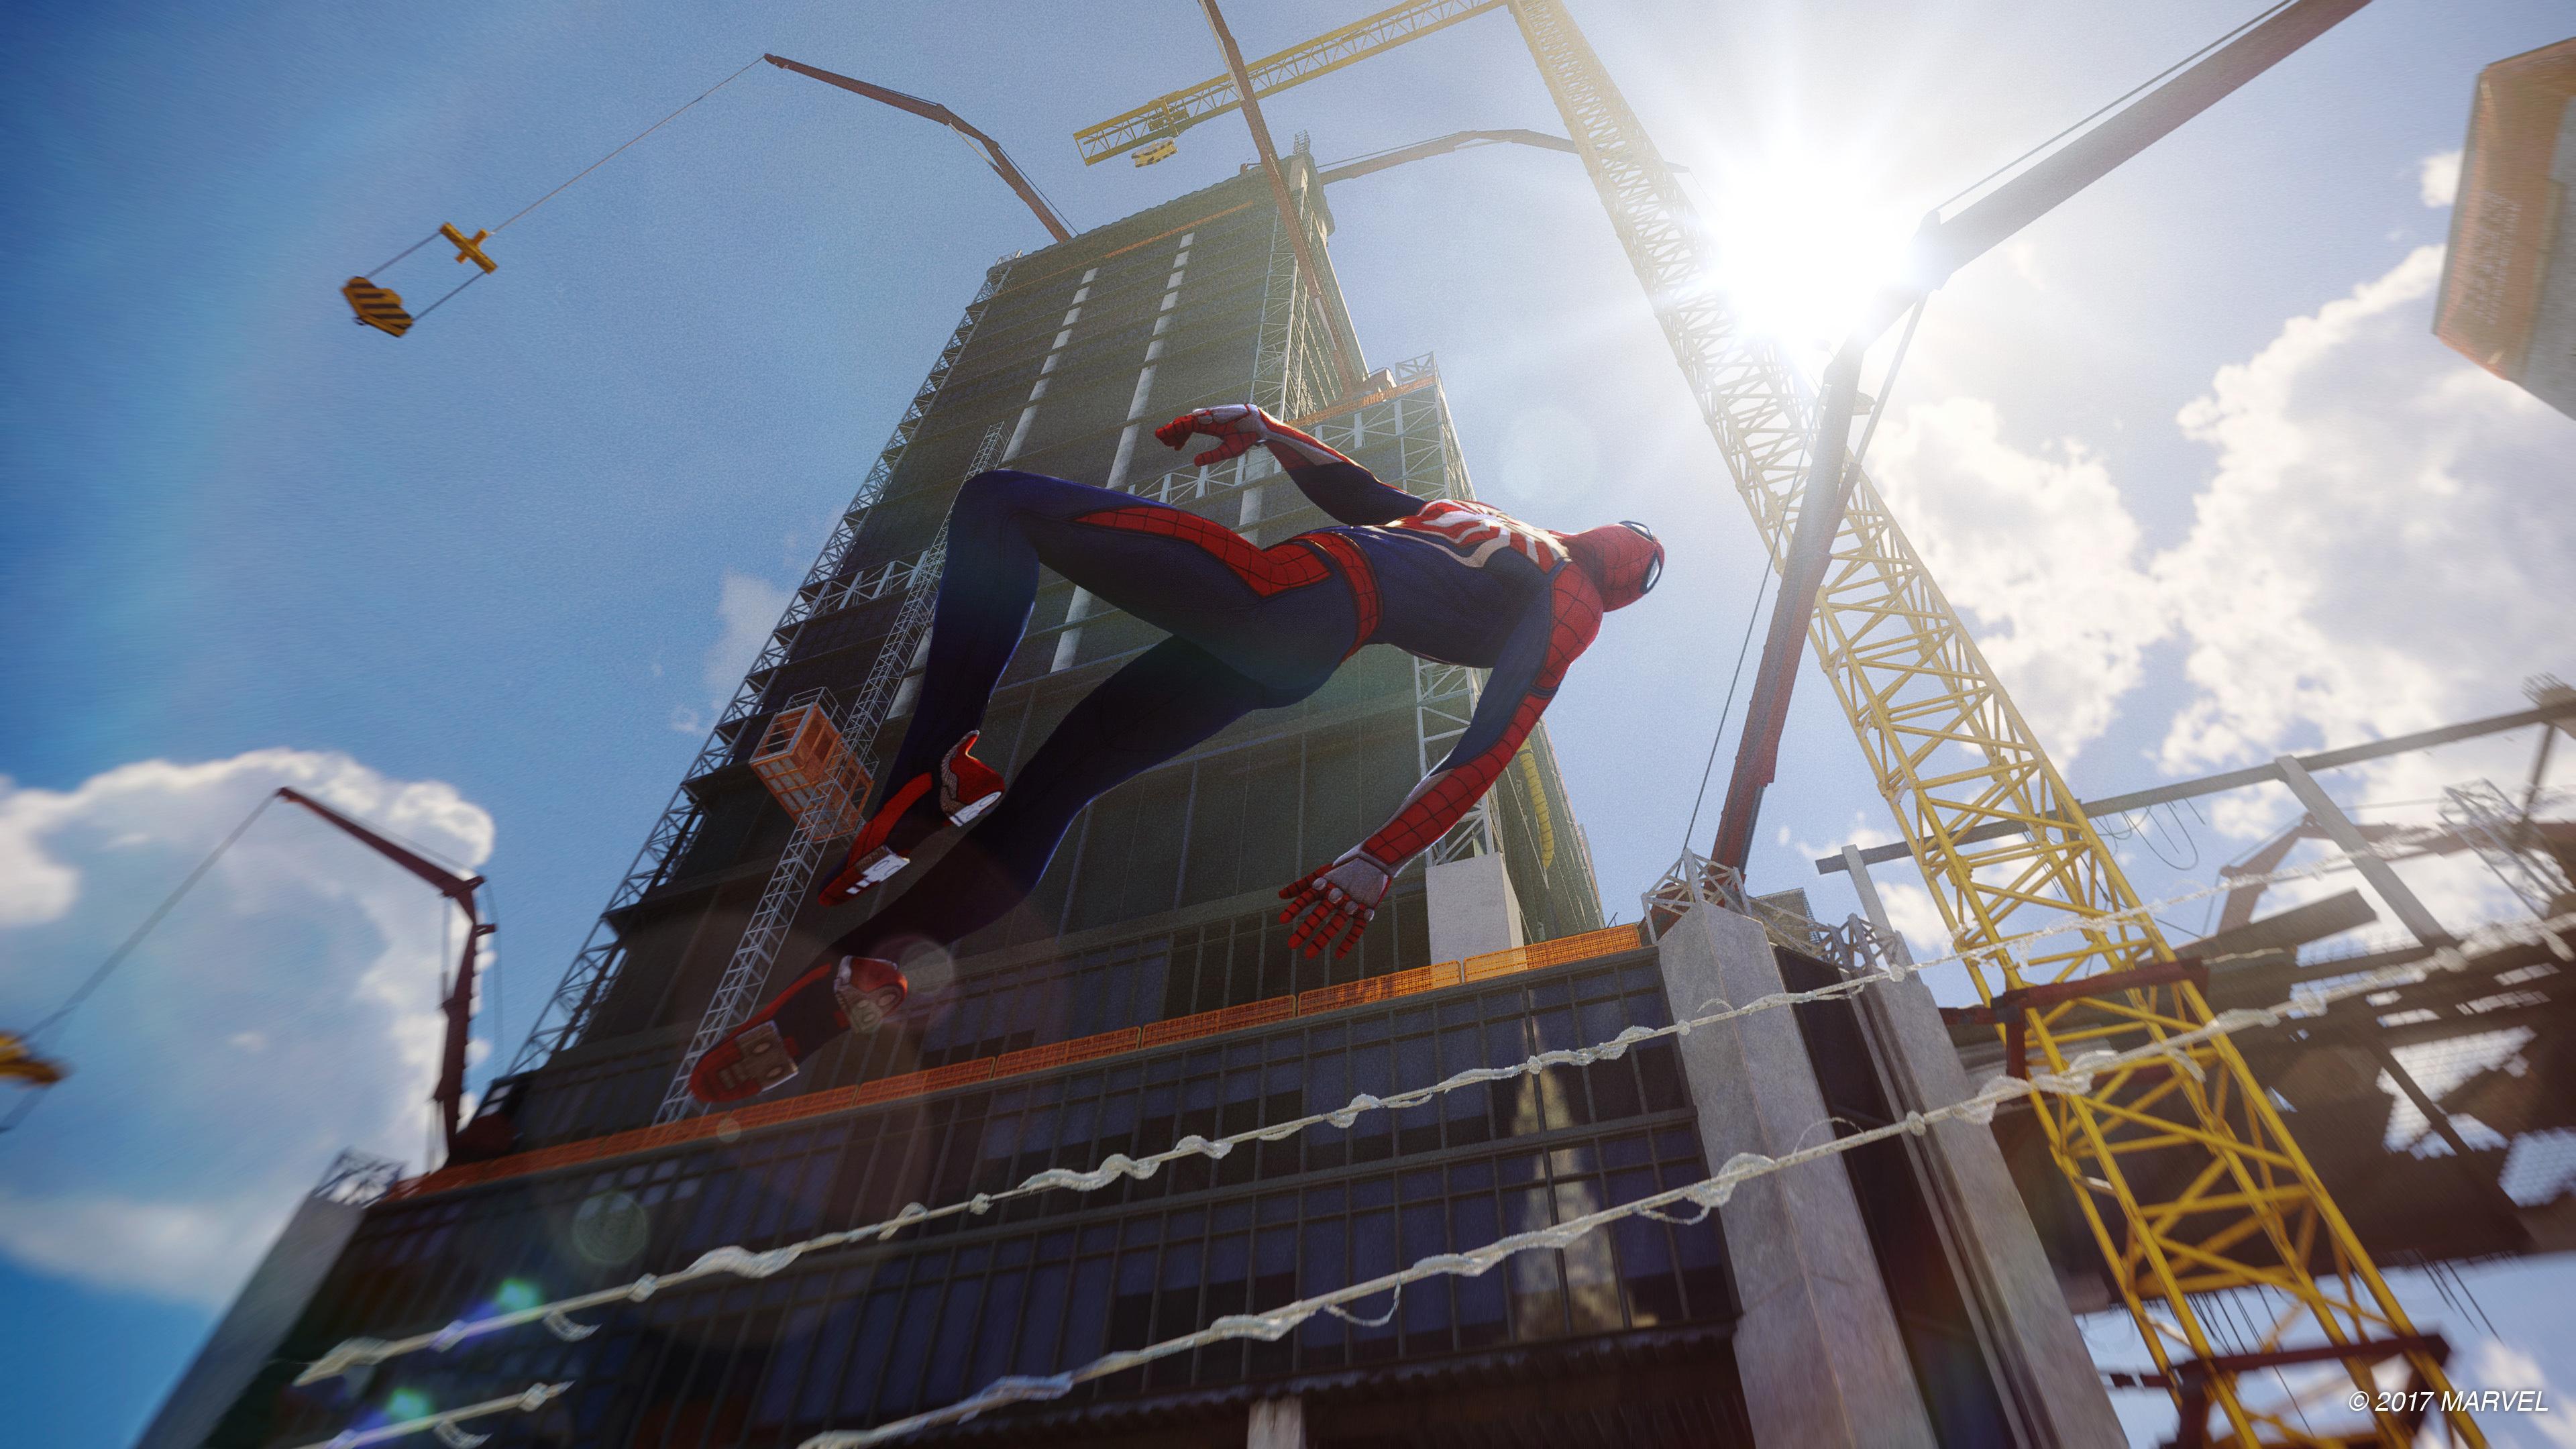 Download 3840x2160 Wallpaper Spider Man Ps4 Pro Video